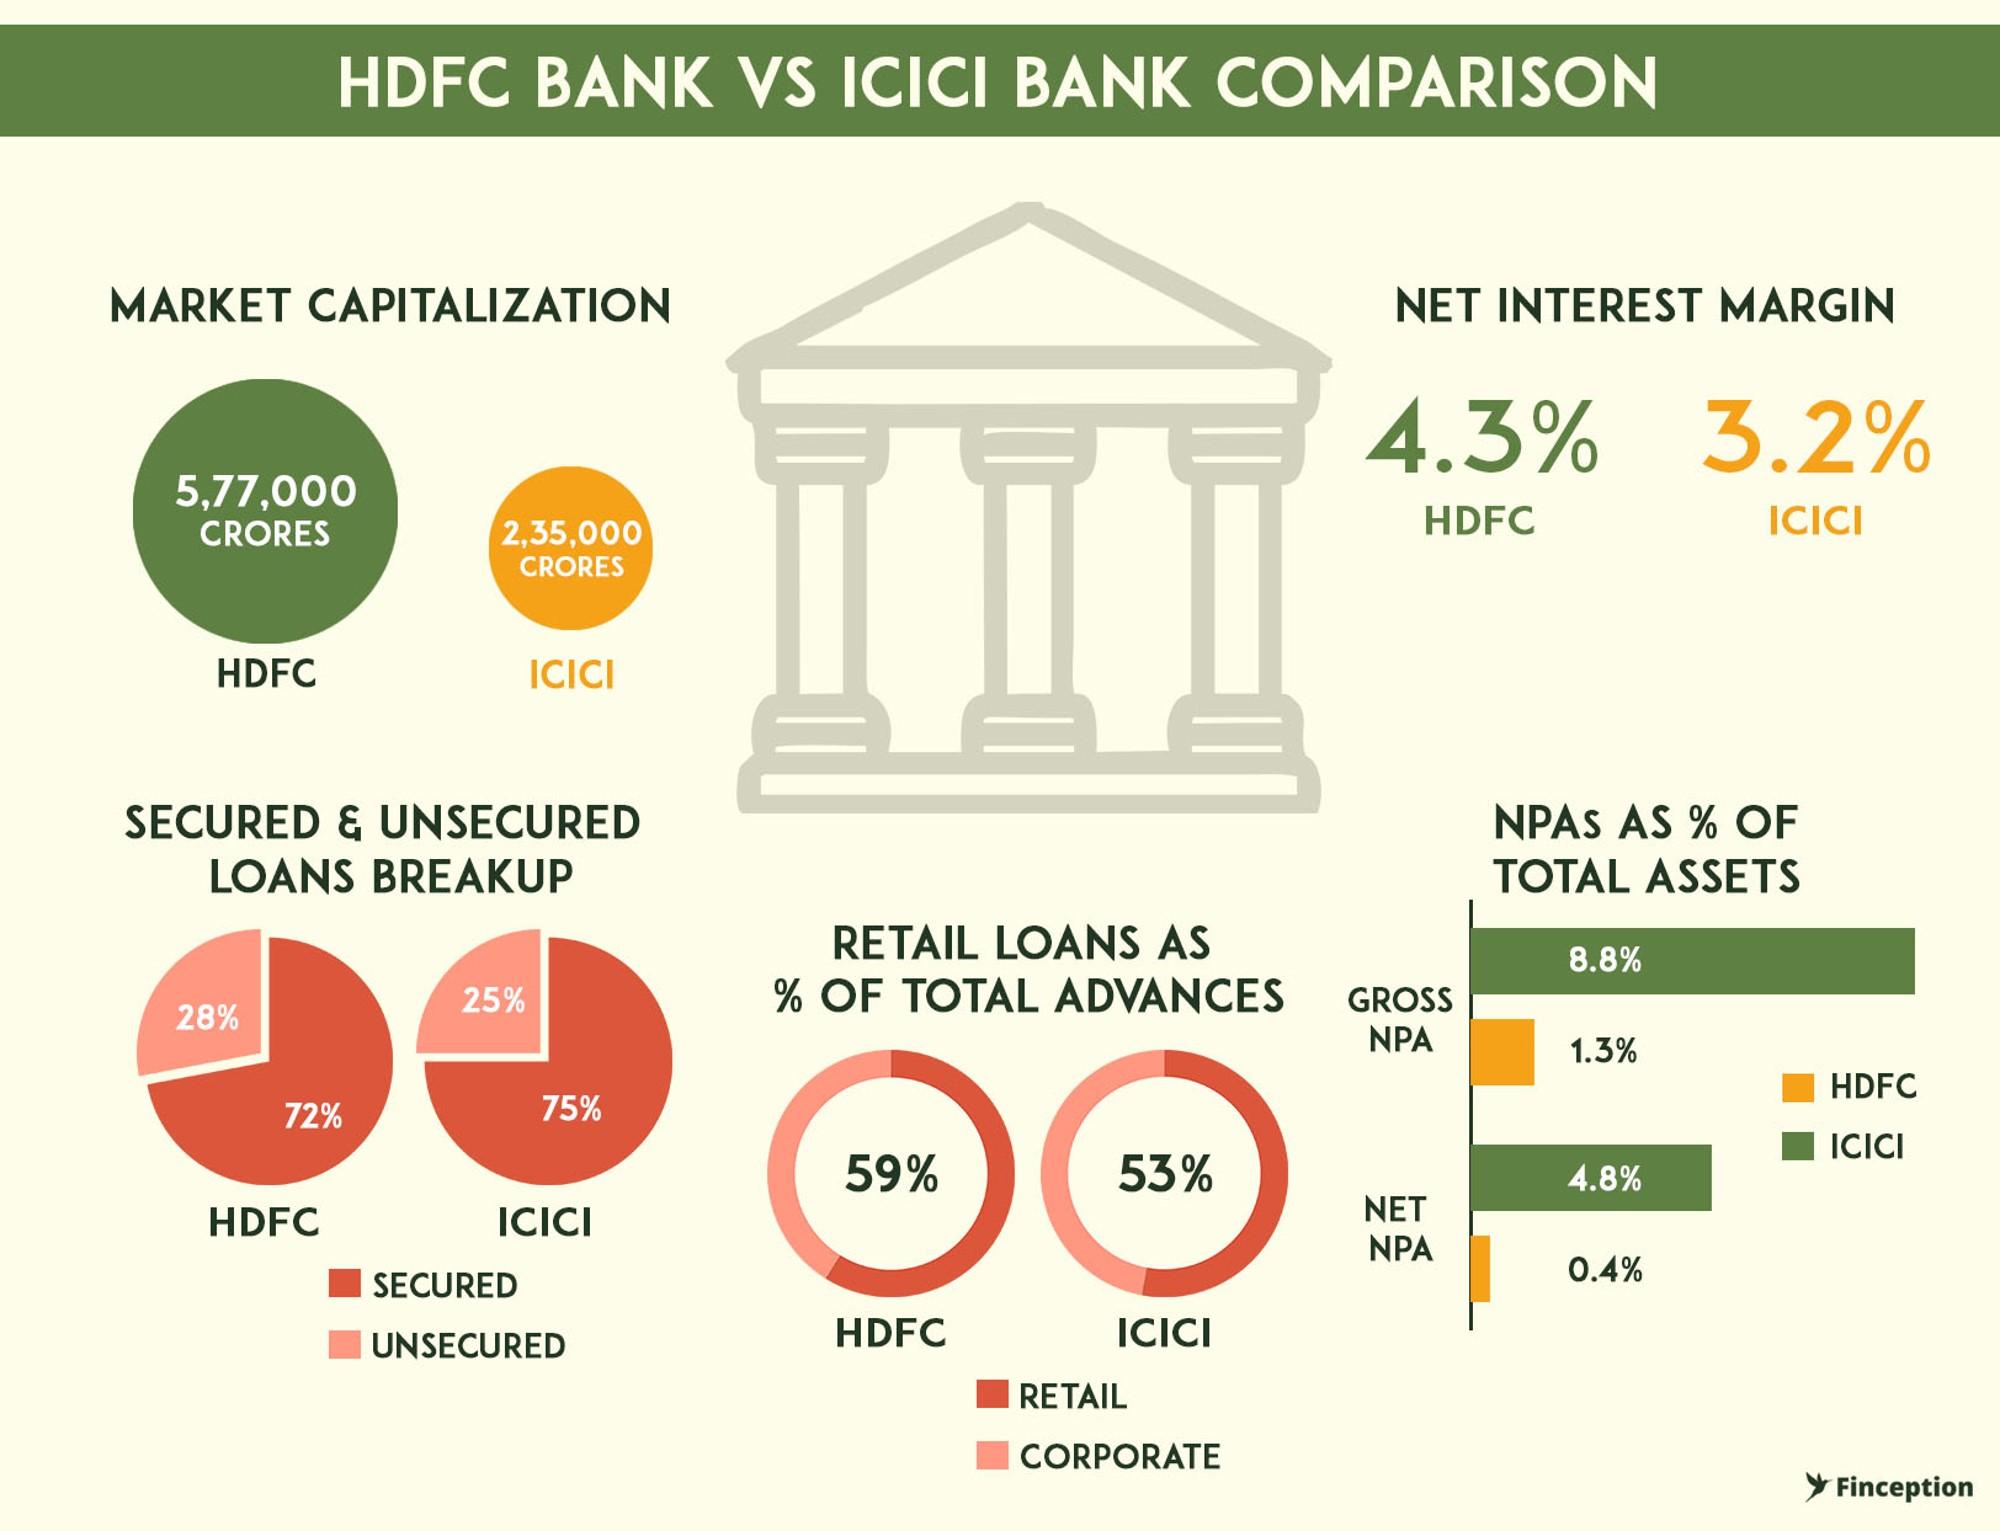 HDFC bank vs ICICI Bank Operational metrics